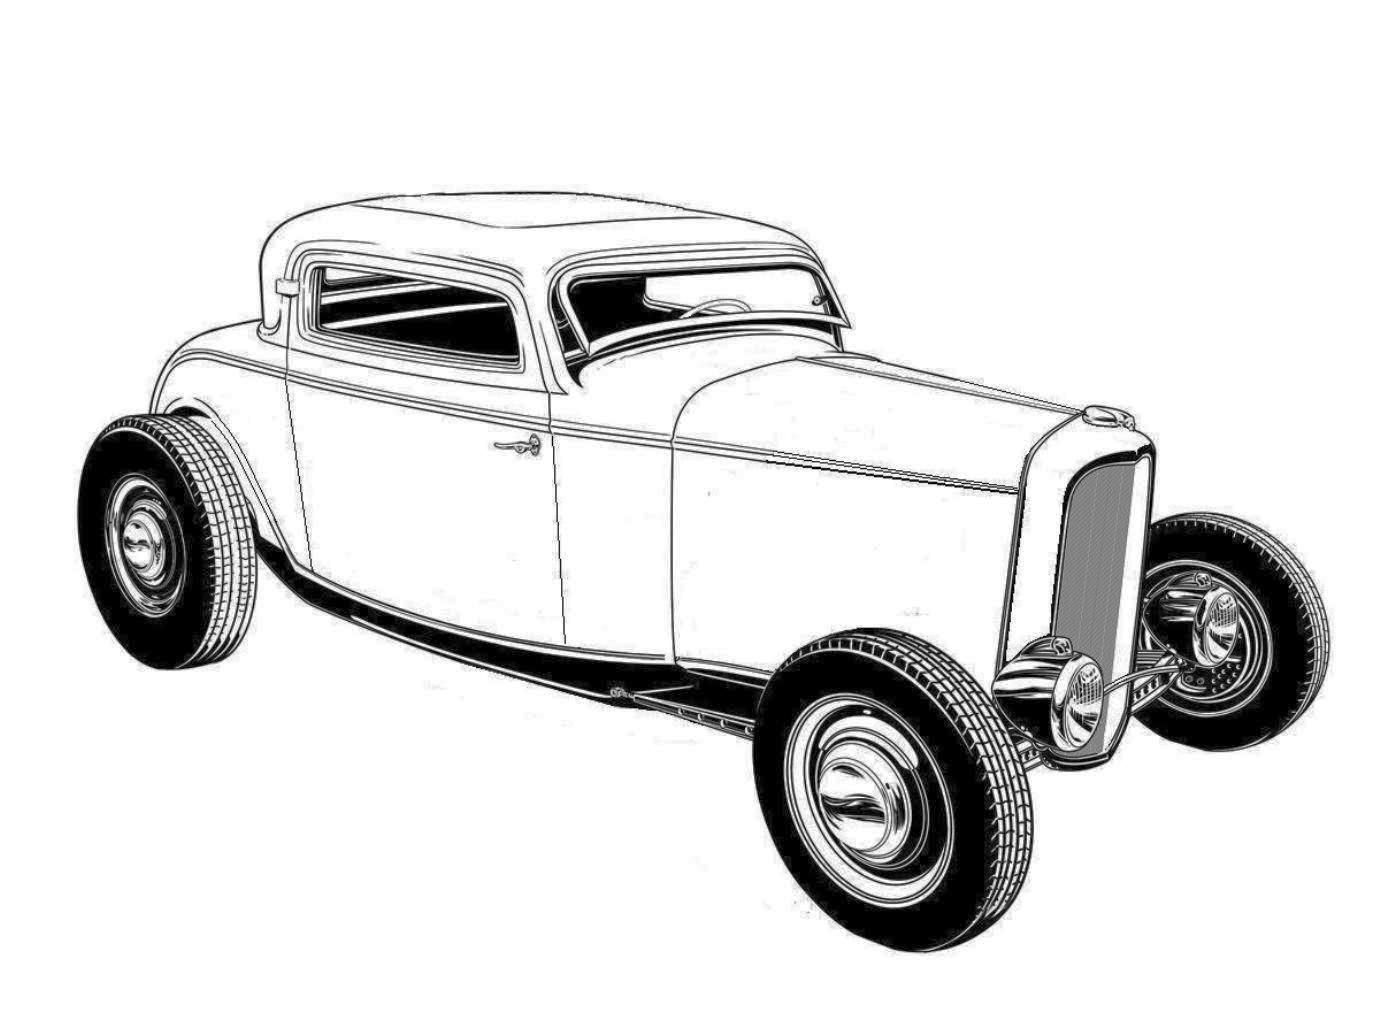 Pin de Luis E. en Roadster | Pinterest | Caricaturas y Planos